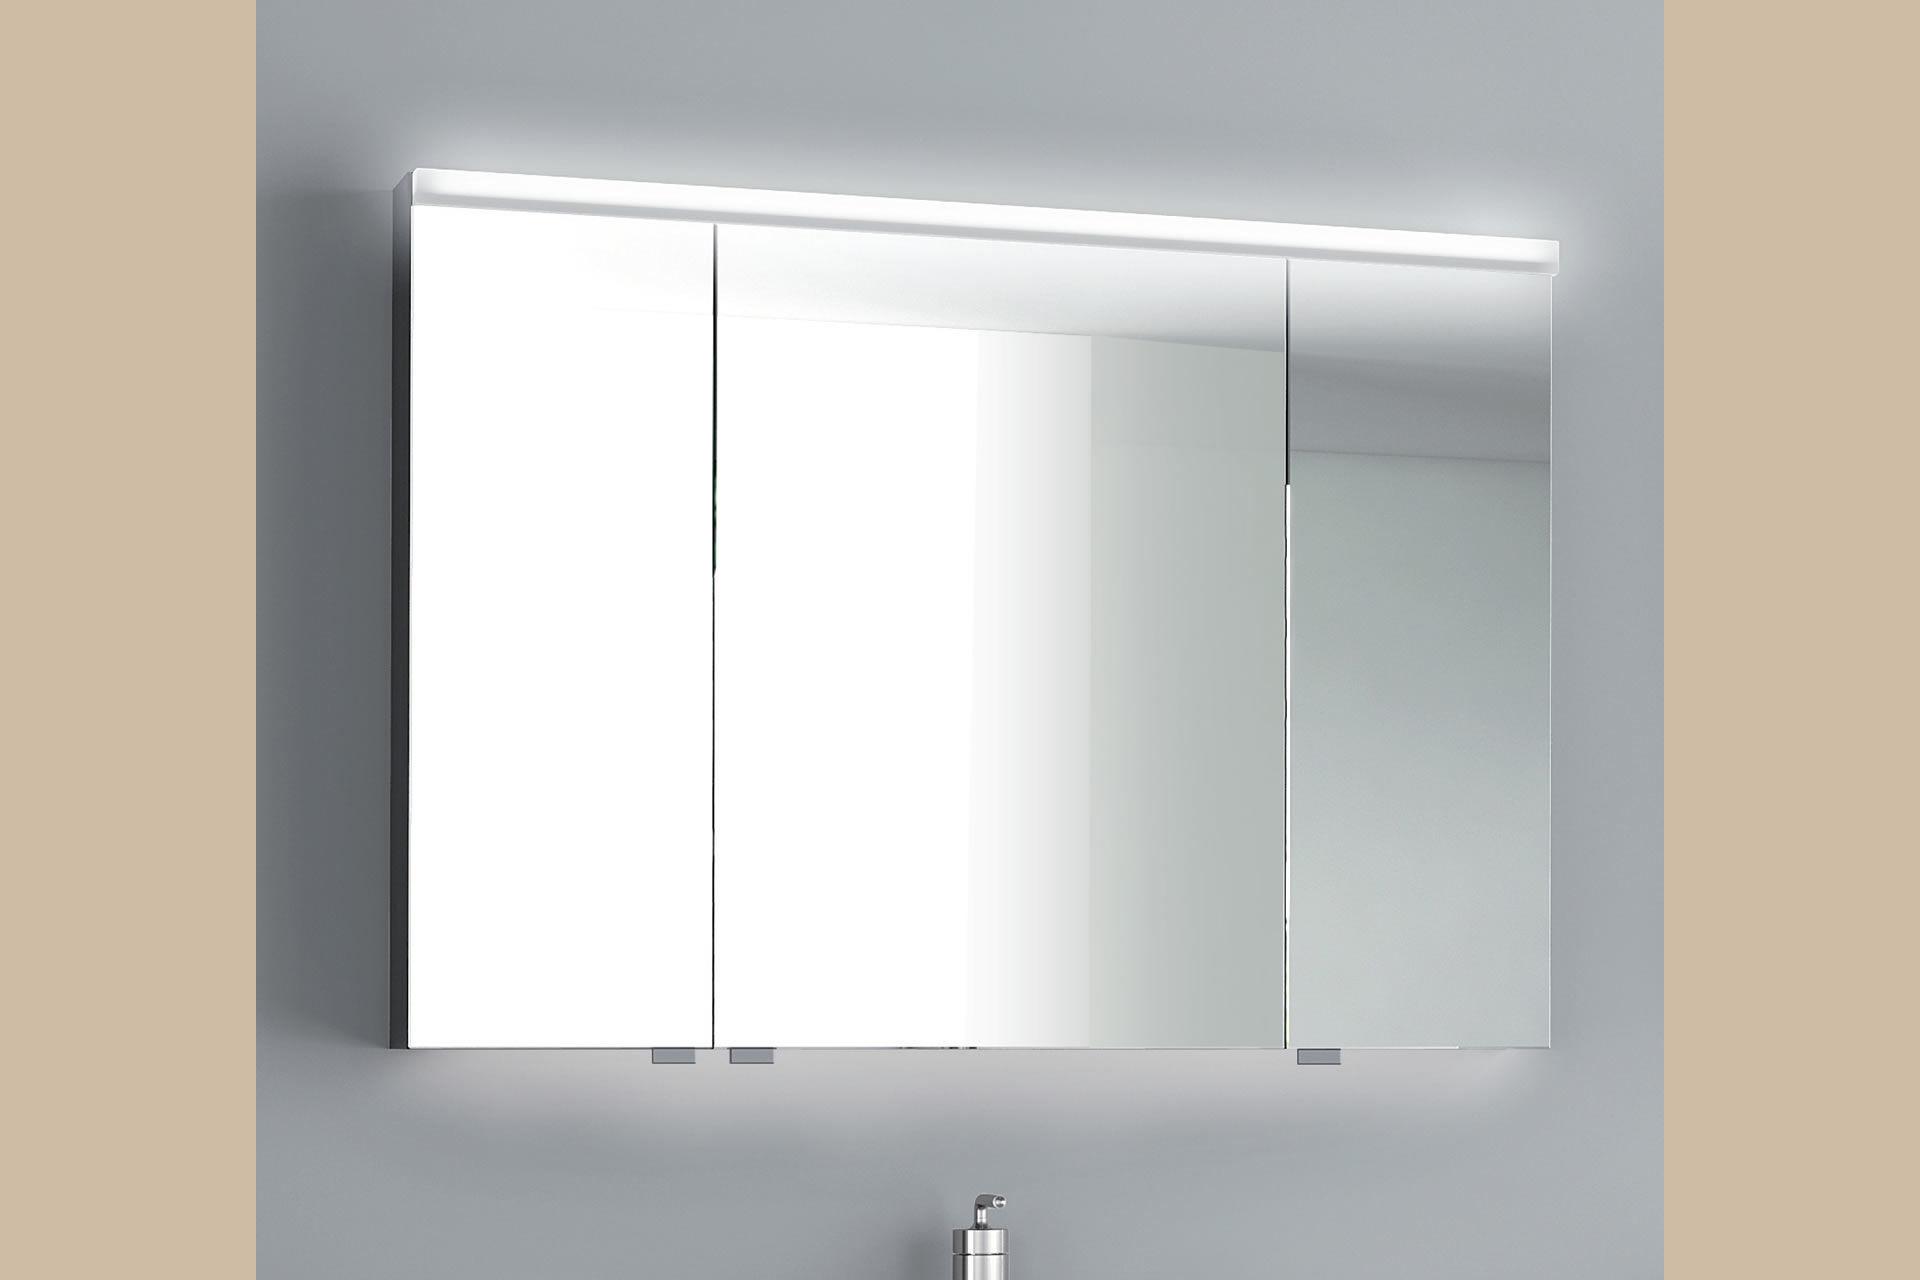 Mirrored bathroom wall cabinet - IRIS - ISA BAGNO